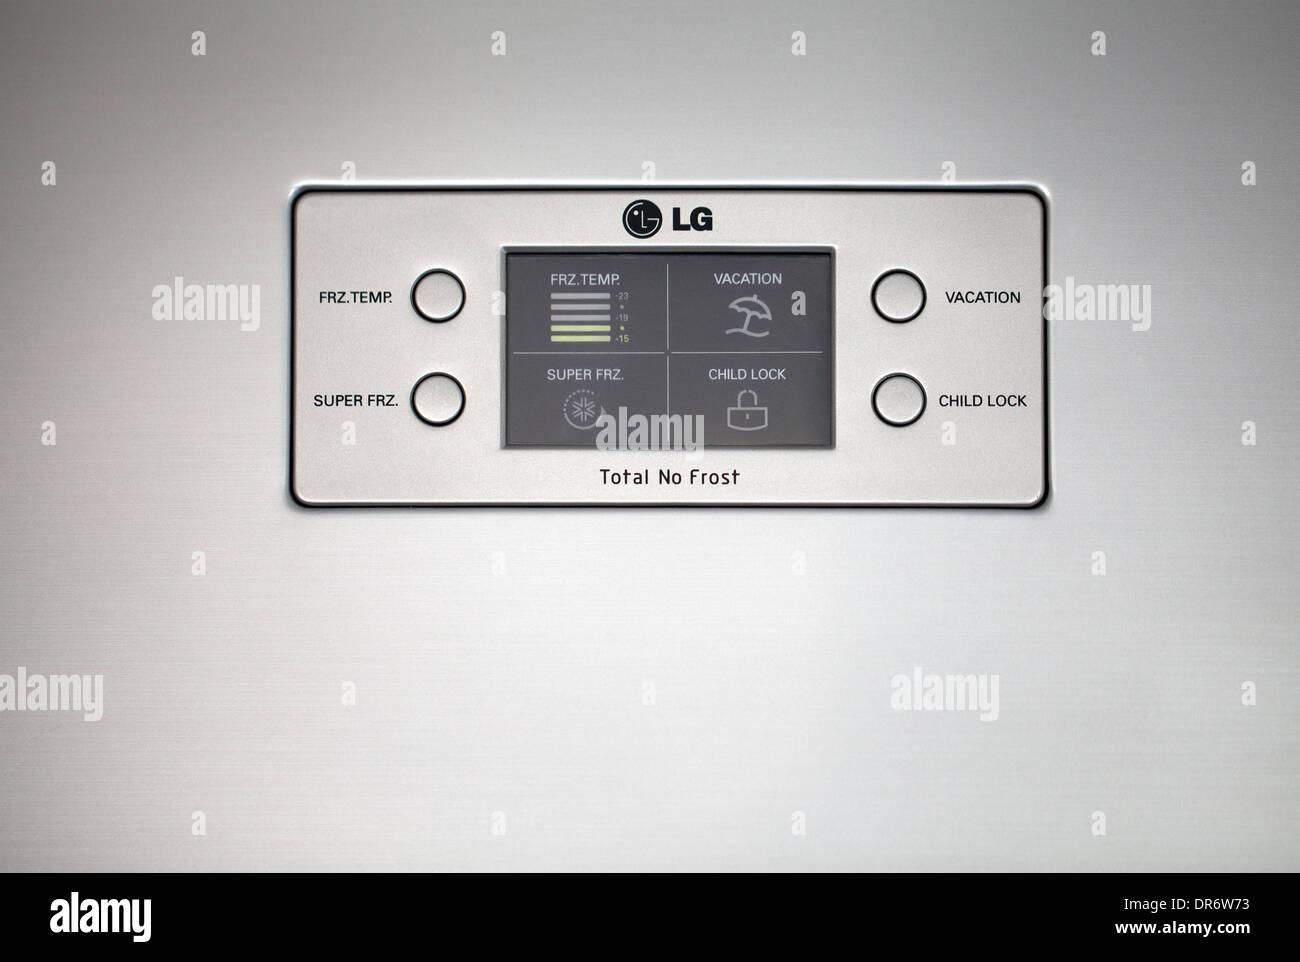 Kühlschrank Lg : Lg kühlschrank gram umluft kühlschrank compact k lg l n